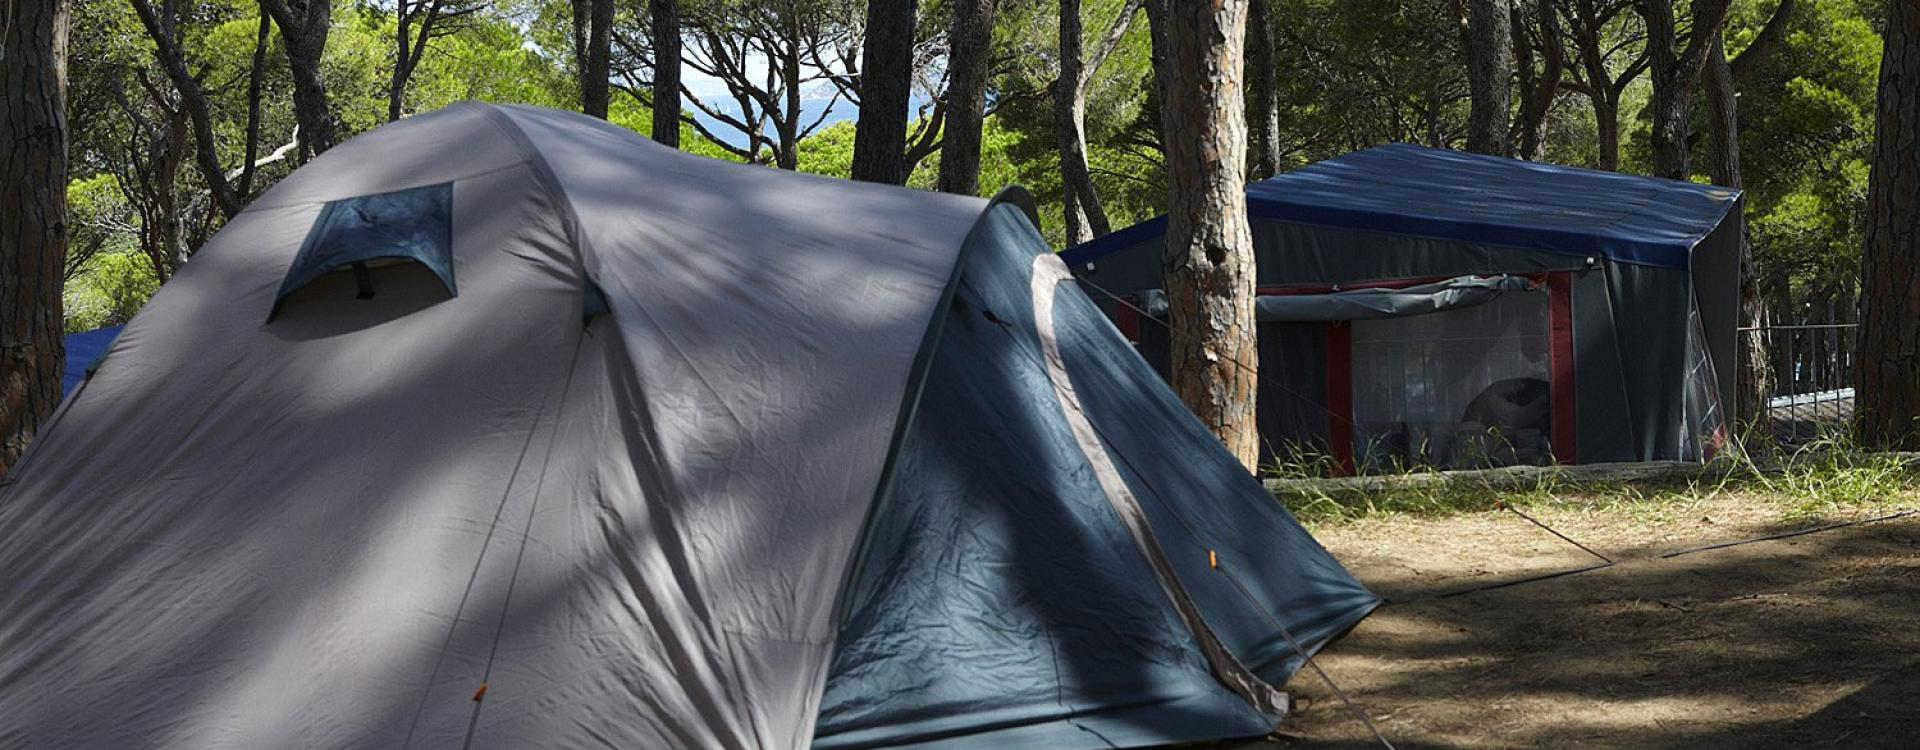 Tent op Camping Interpals - Costa Brava